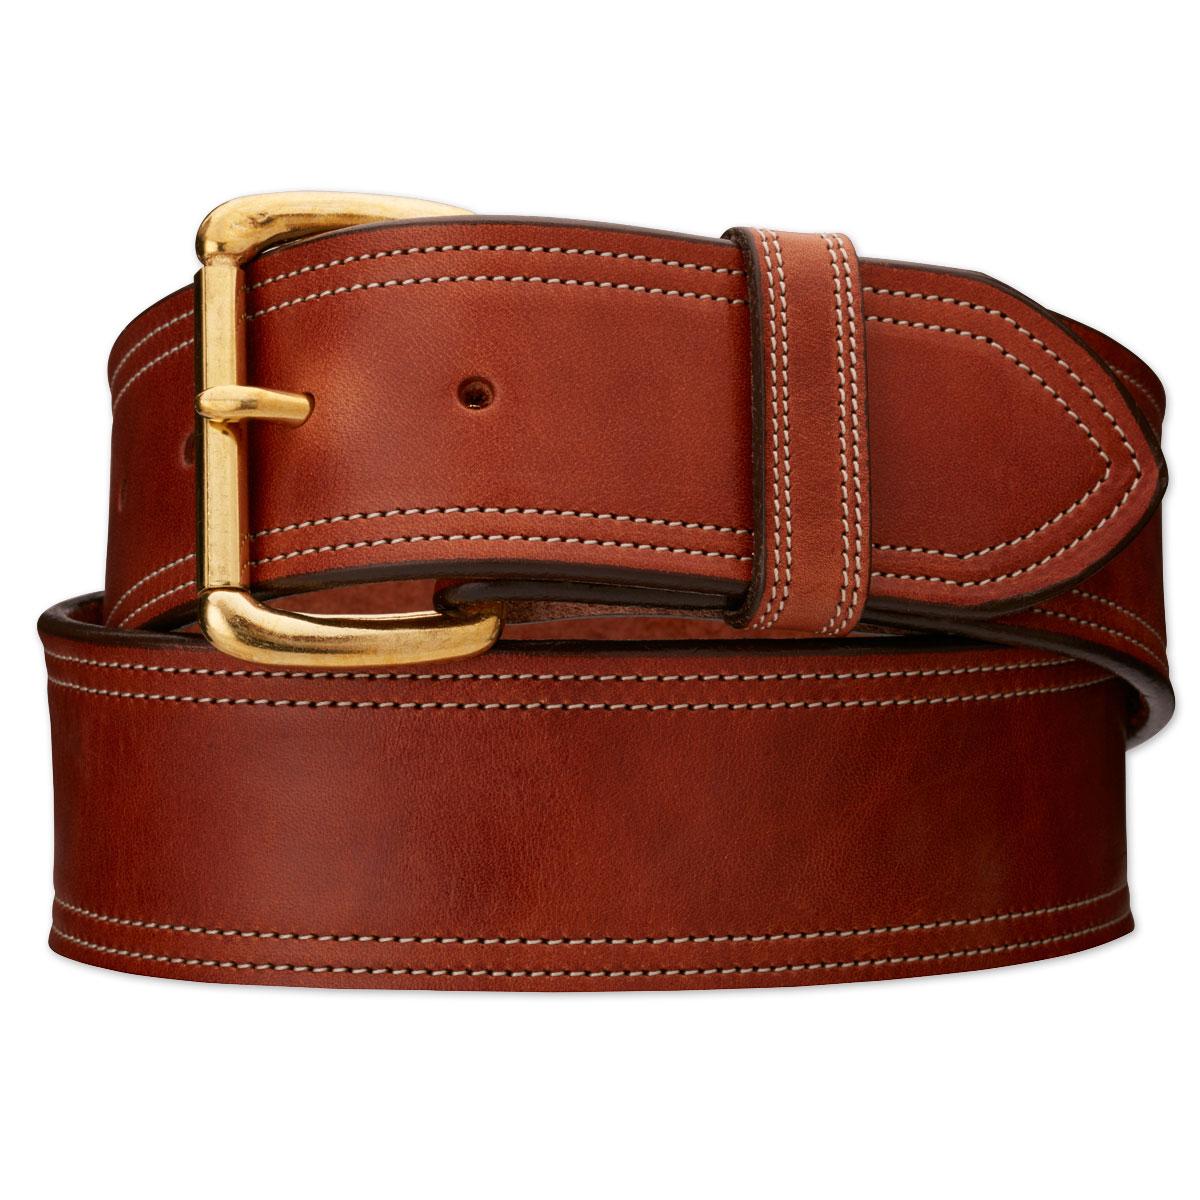 Tory Leather Trim Stitched Belt